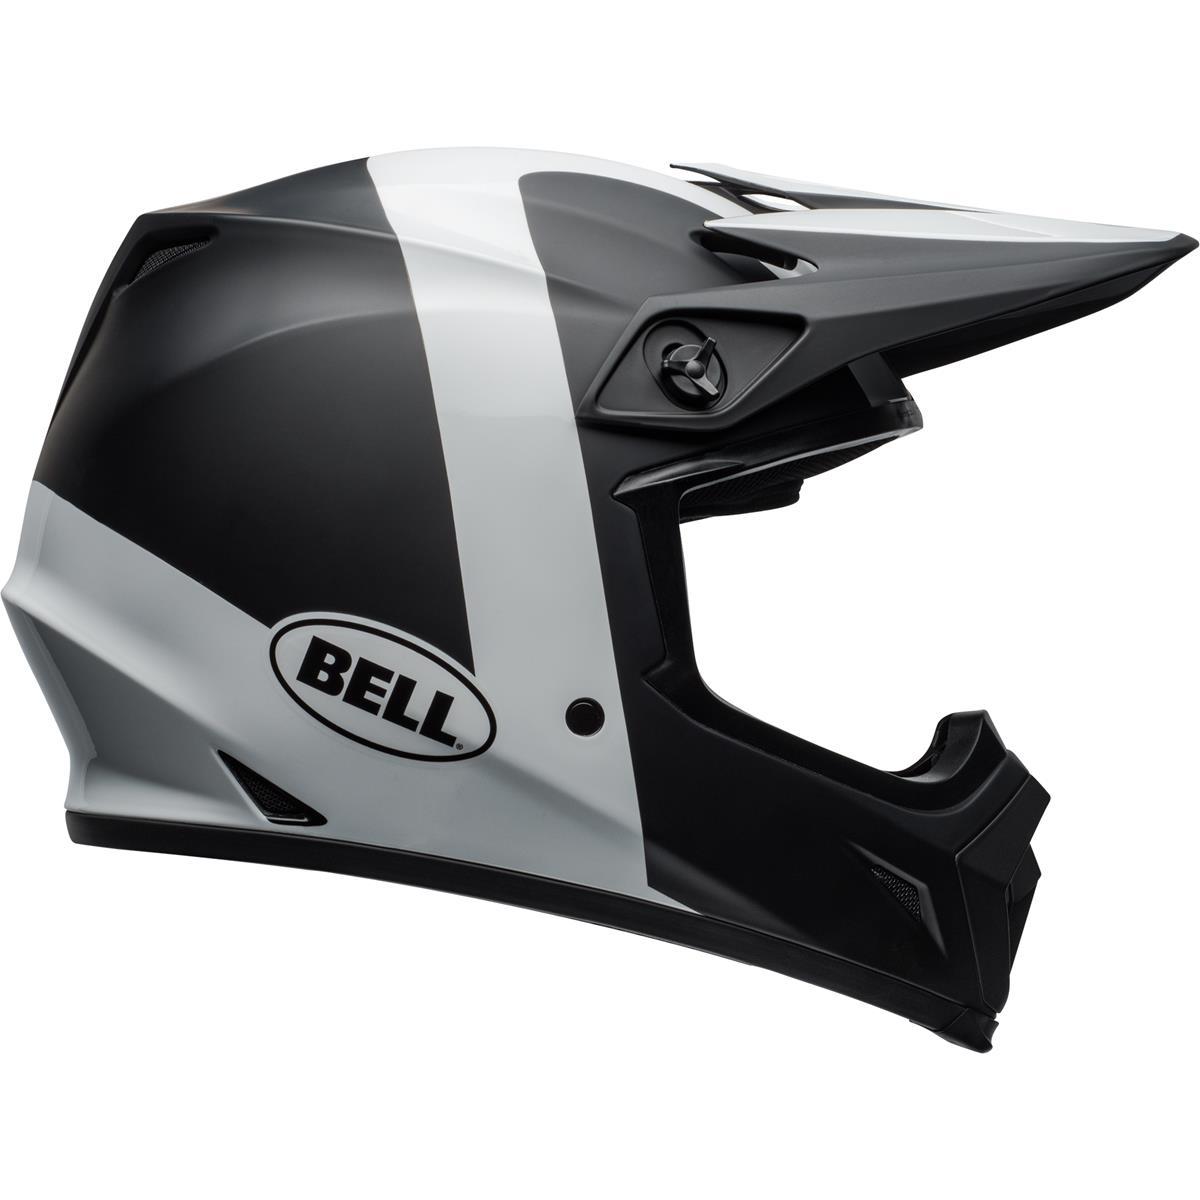 CASCO Bell mx-9 MIPS Presence-Nero//Bianco